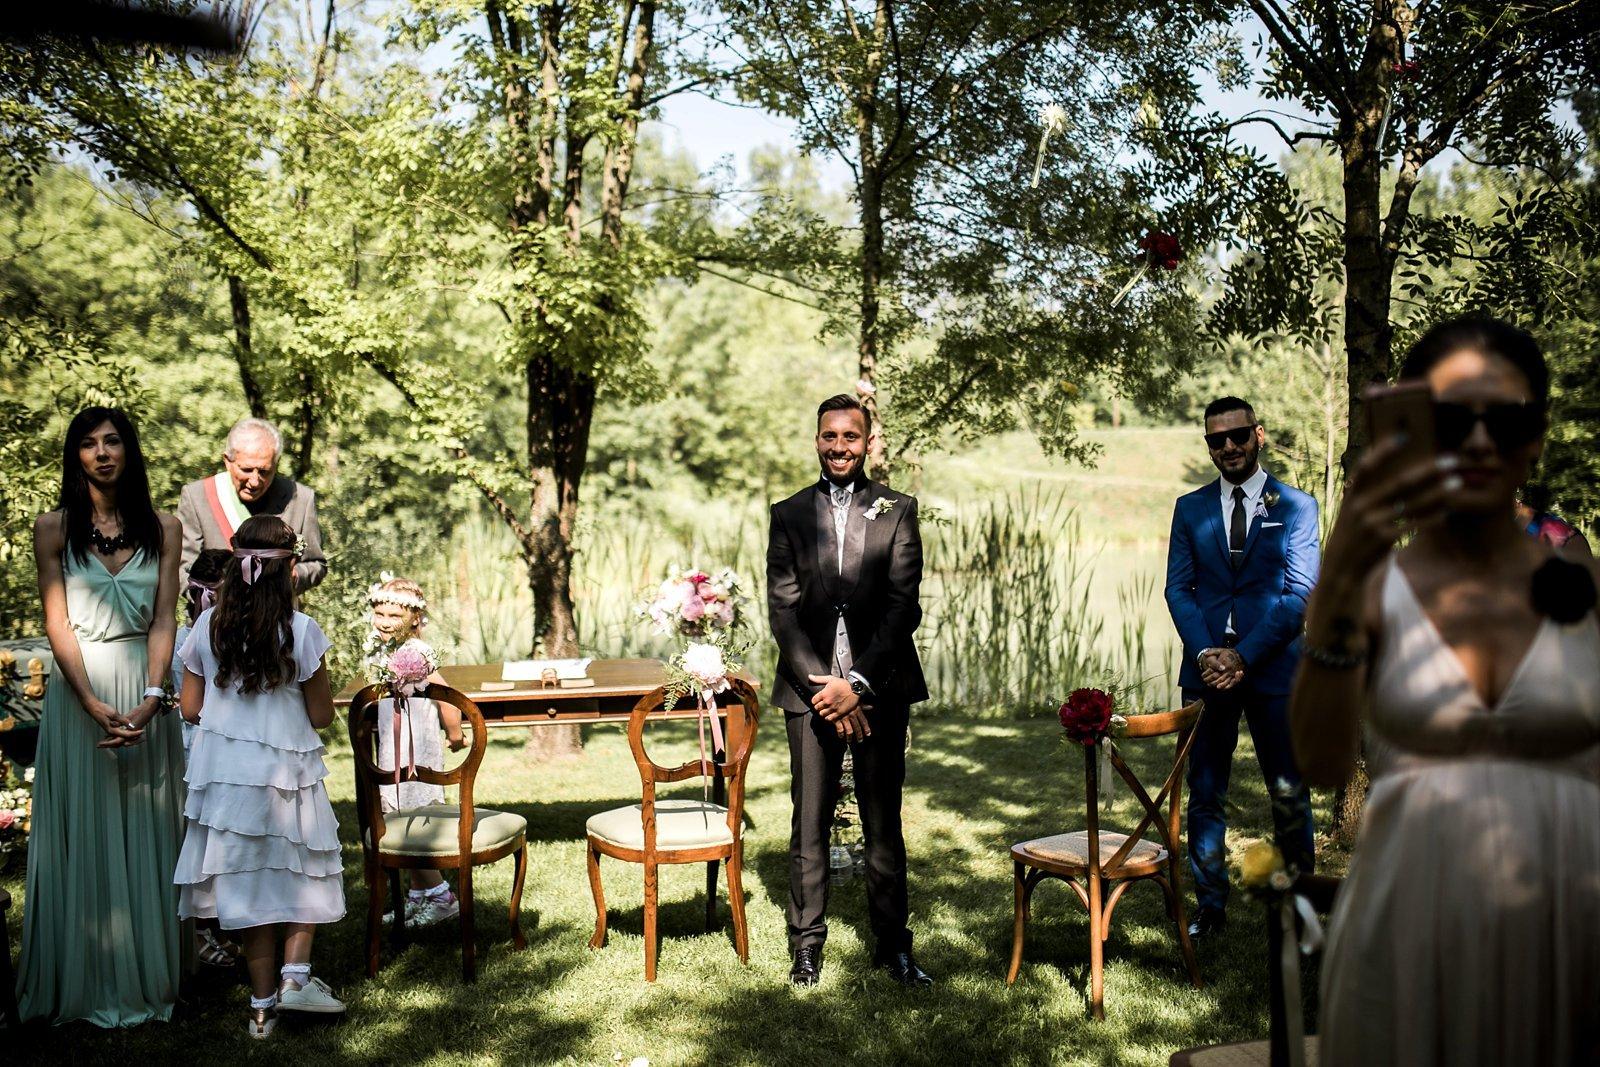 Matrimonio In Verona : Convento annunciata medole matrimonio fotografo matrimonio